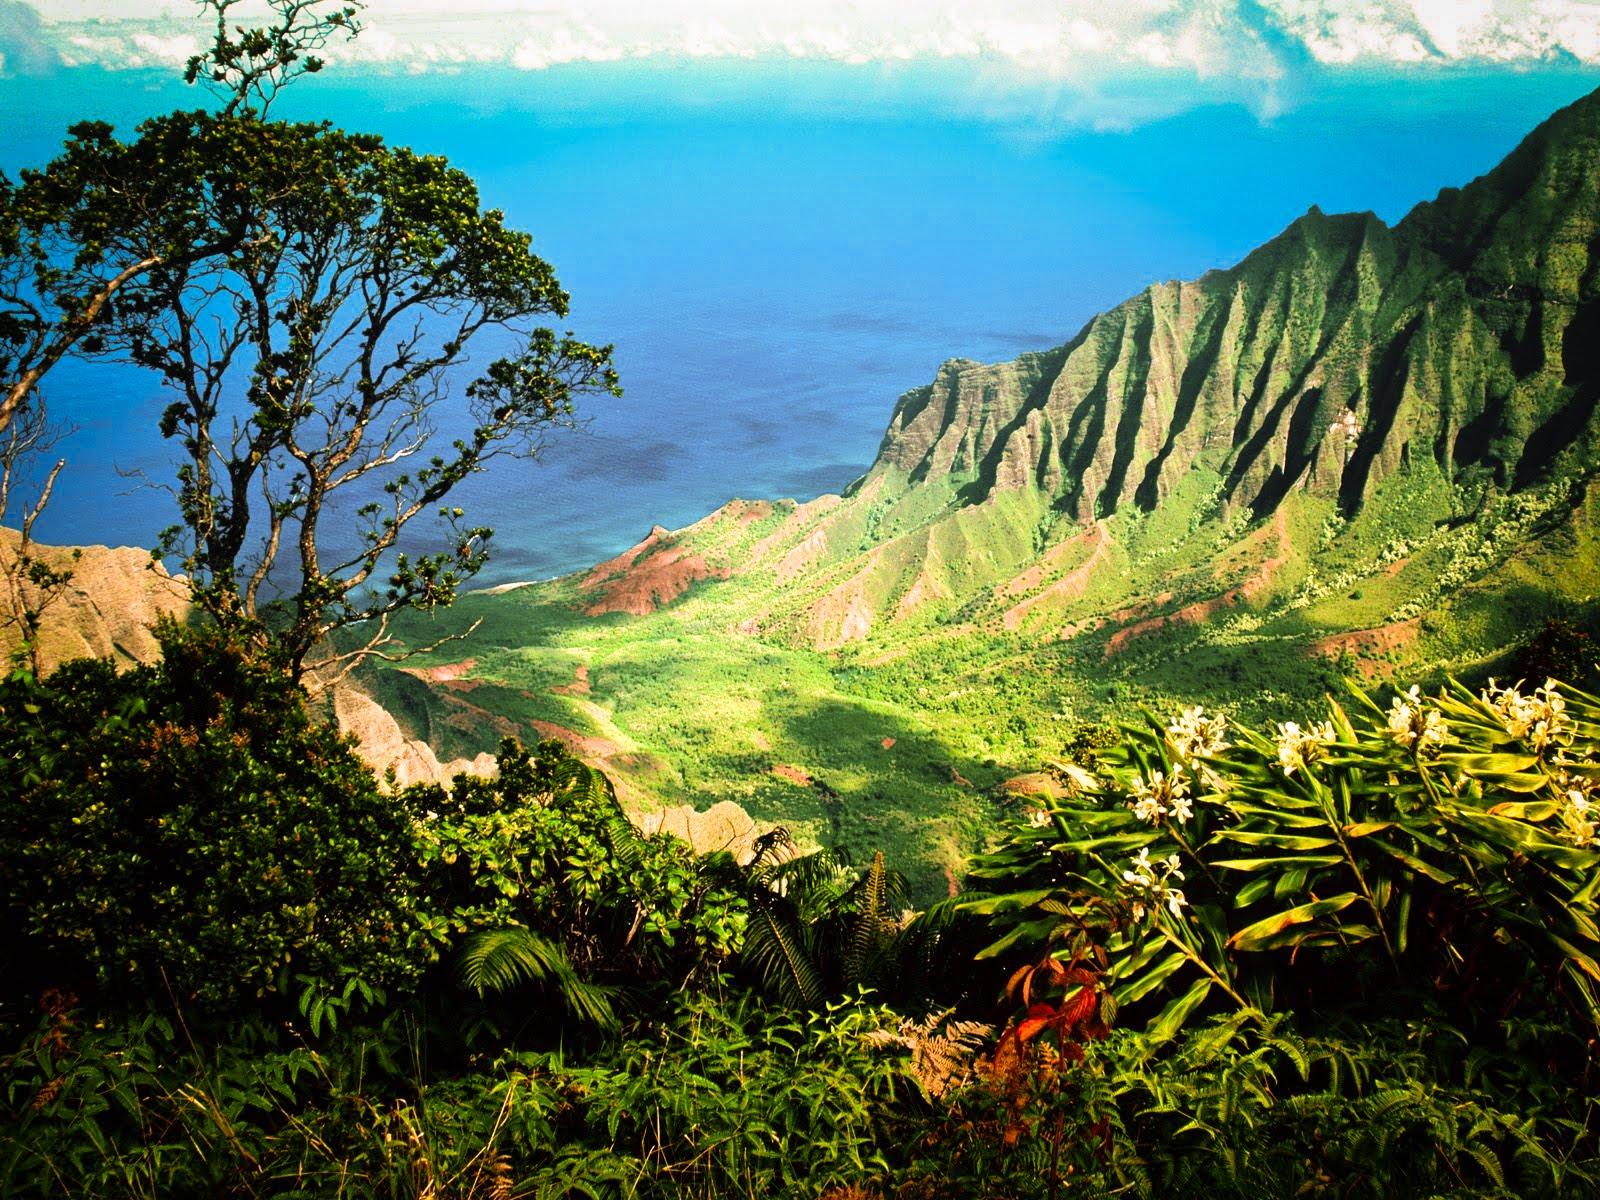 http://4.bp.blogspot.com/-bT8-pGwL9Ho/TrmB163hV_I/AAAAAAAACeU/TaA_Y8tg-As/s1600/Hawaii%252BWallpaper-2.jpg